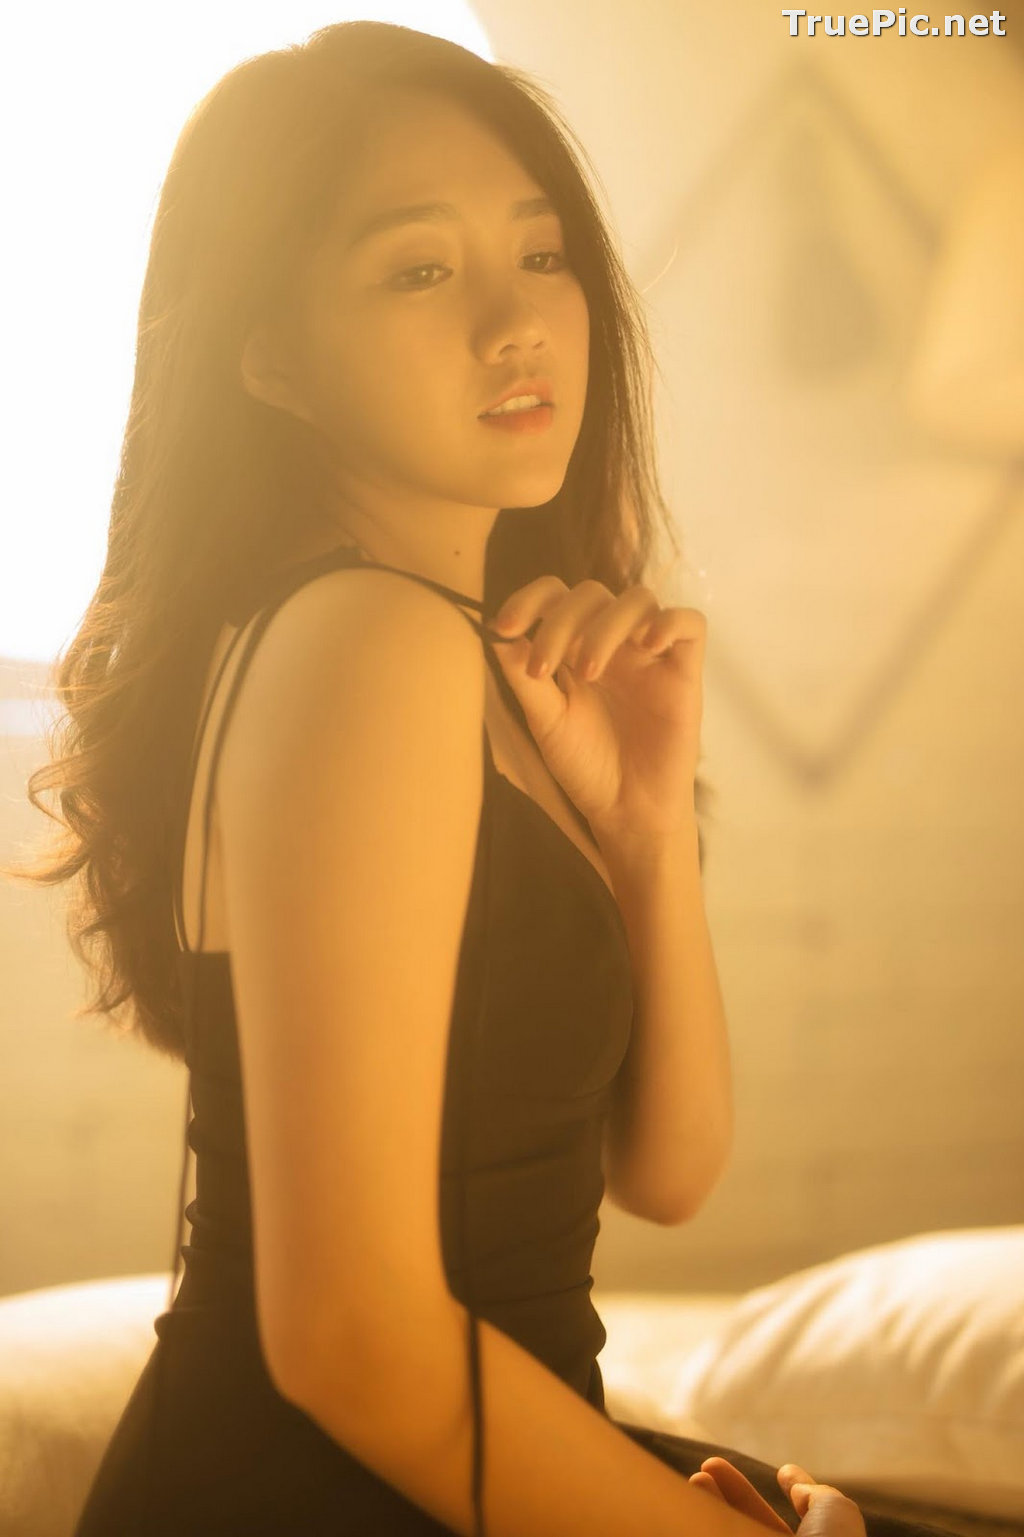 Image Vietnamese Hot Girl - Nguyen Hoang Kieu Trinh - My Black Angel - TruePic.net - Picture-28